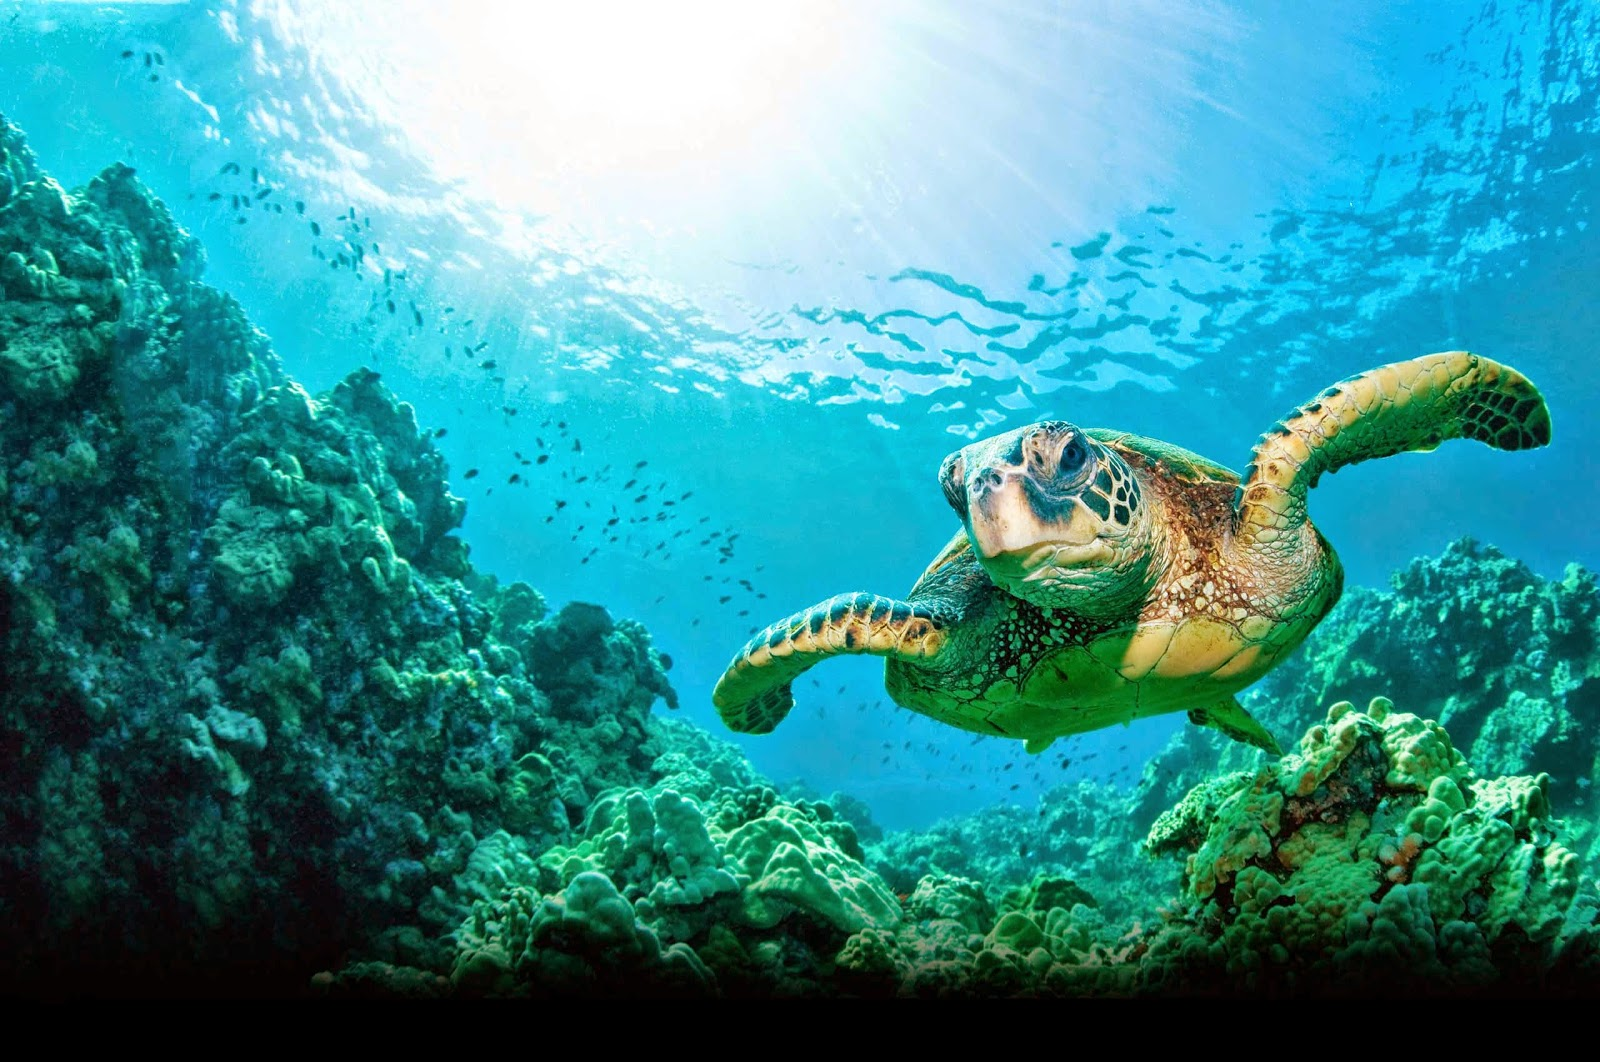 Sea Turtle - HD Wallpapers   Earth Blog